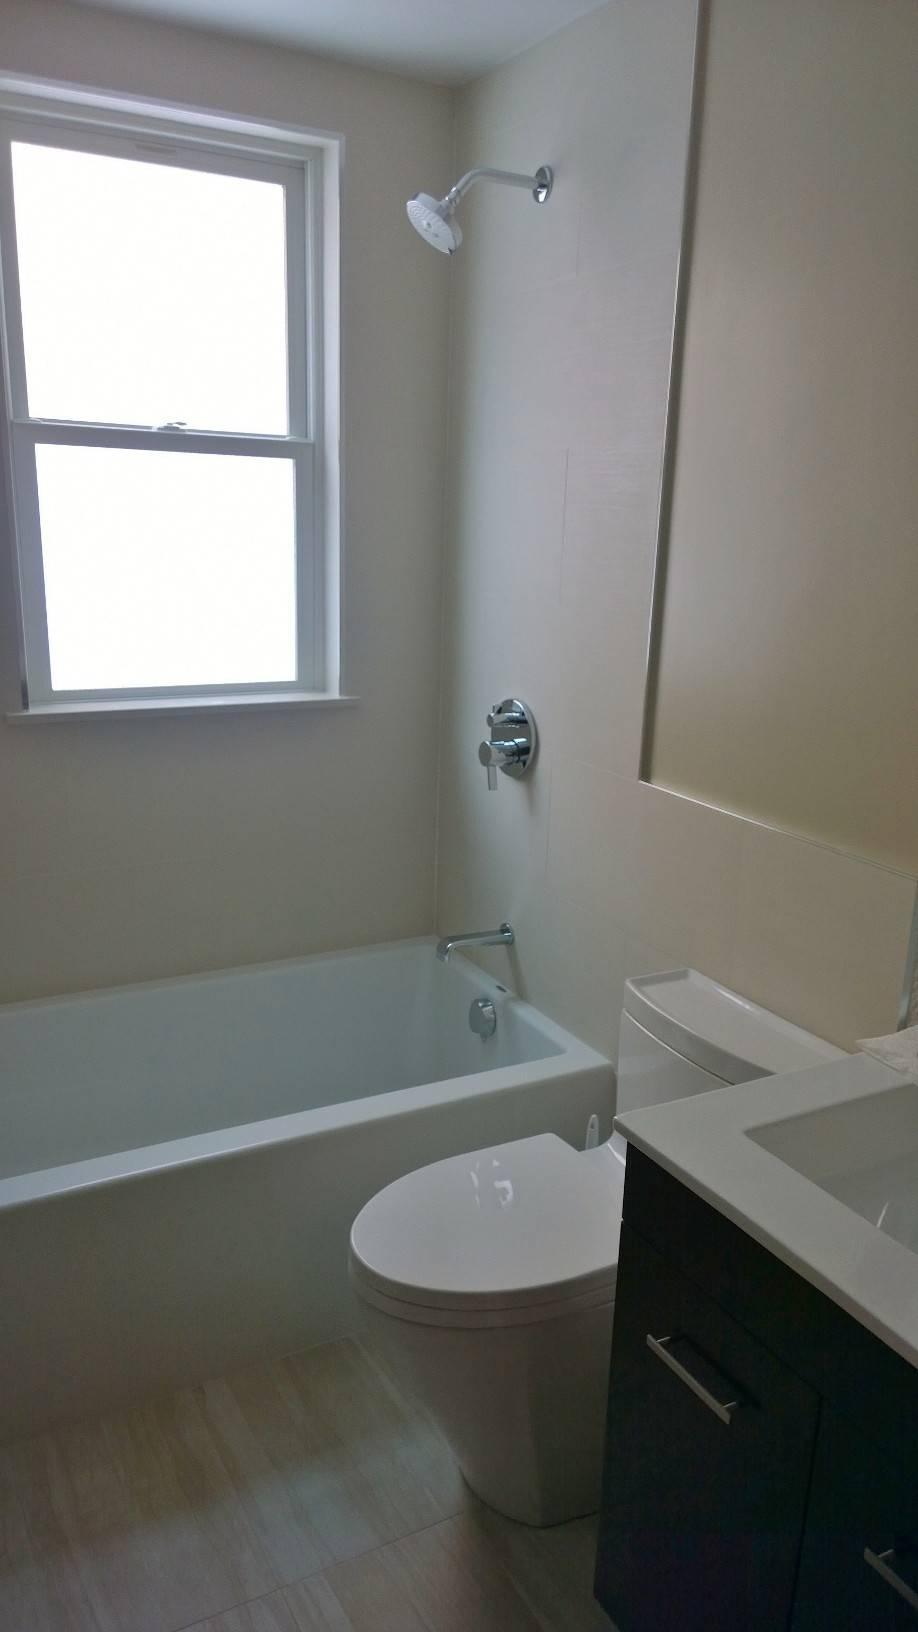 Long Shot of the Bathroom